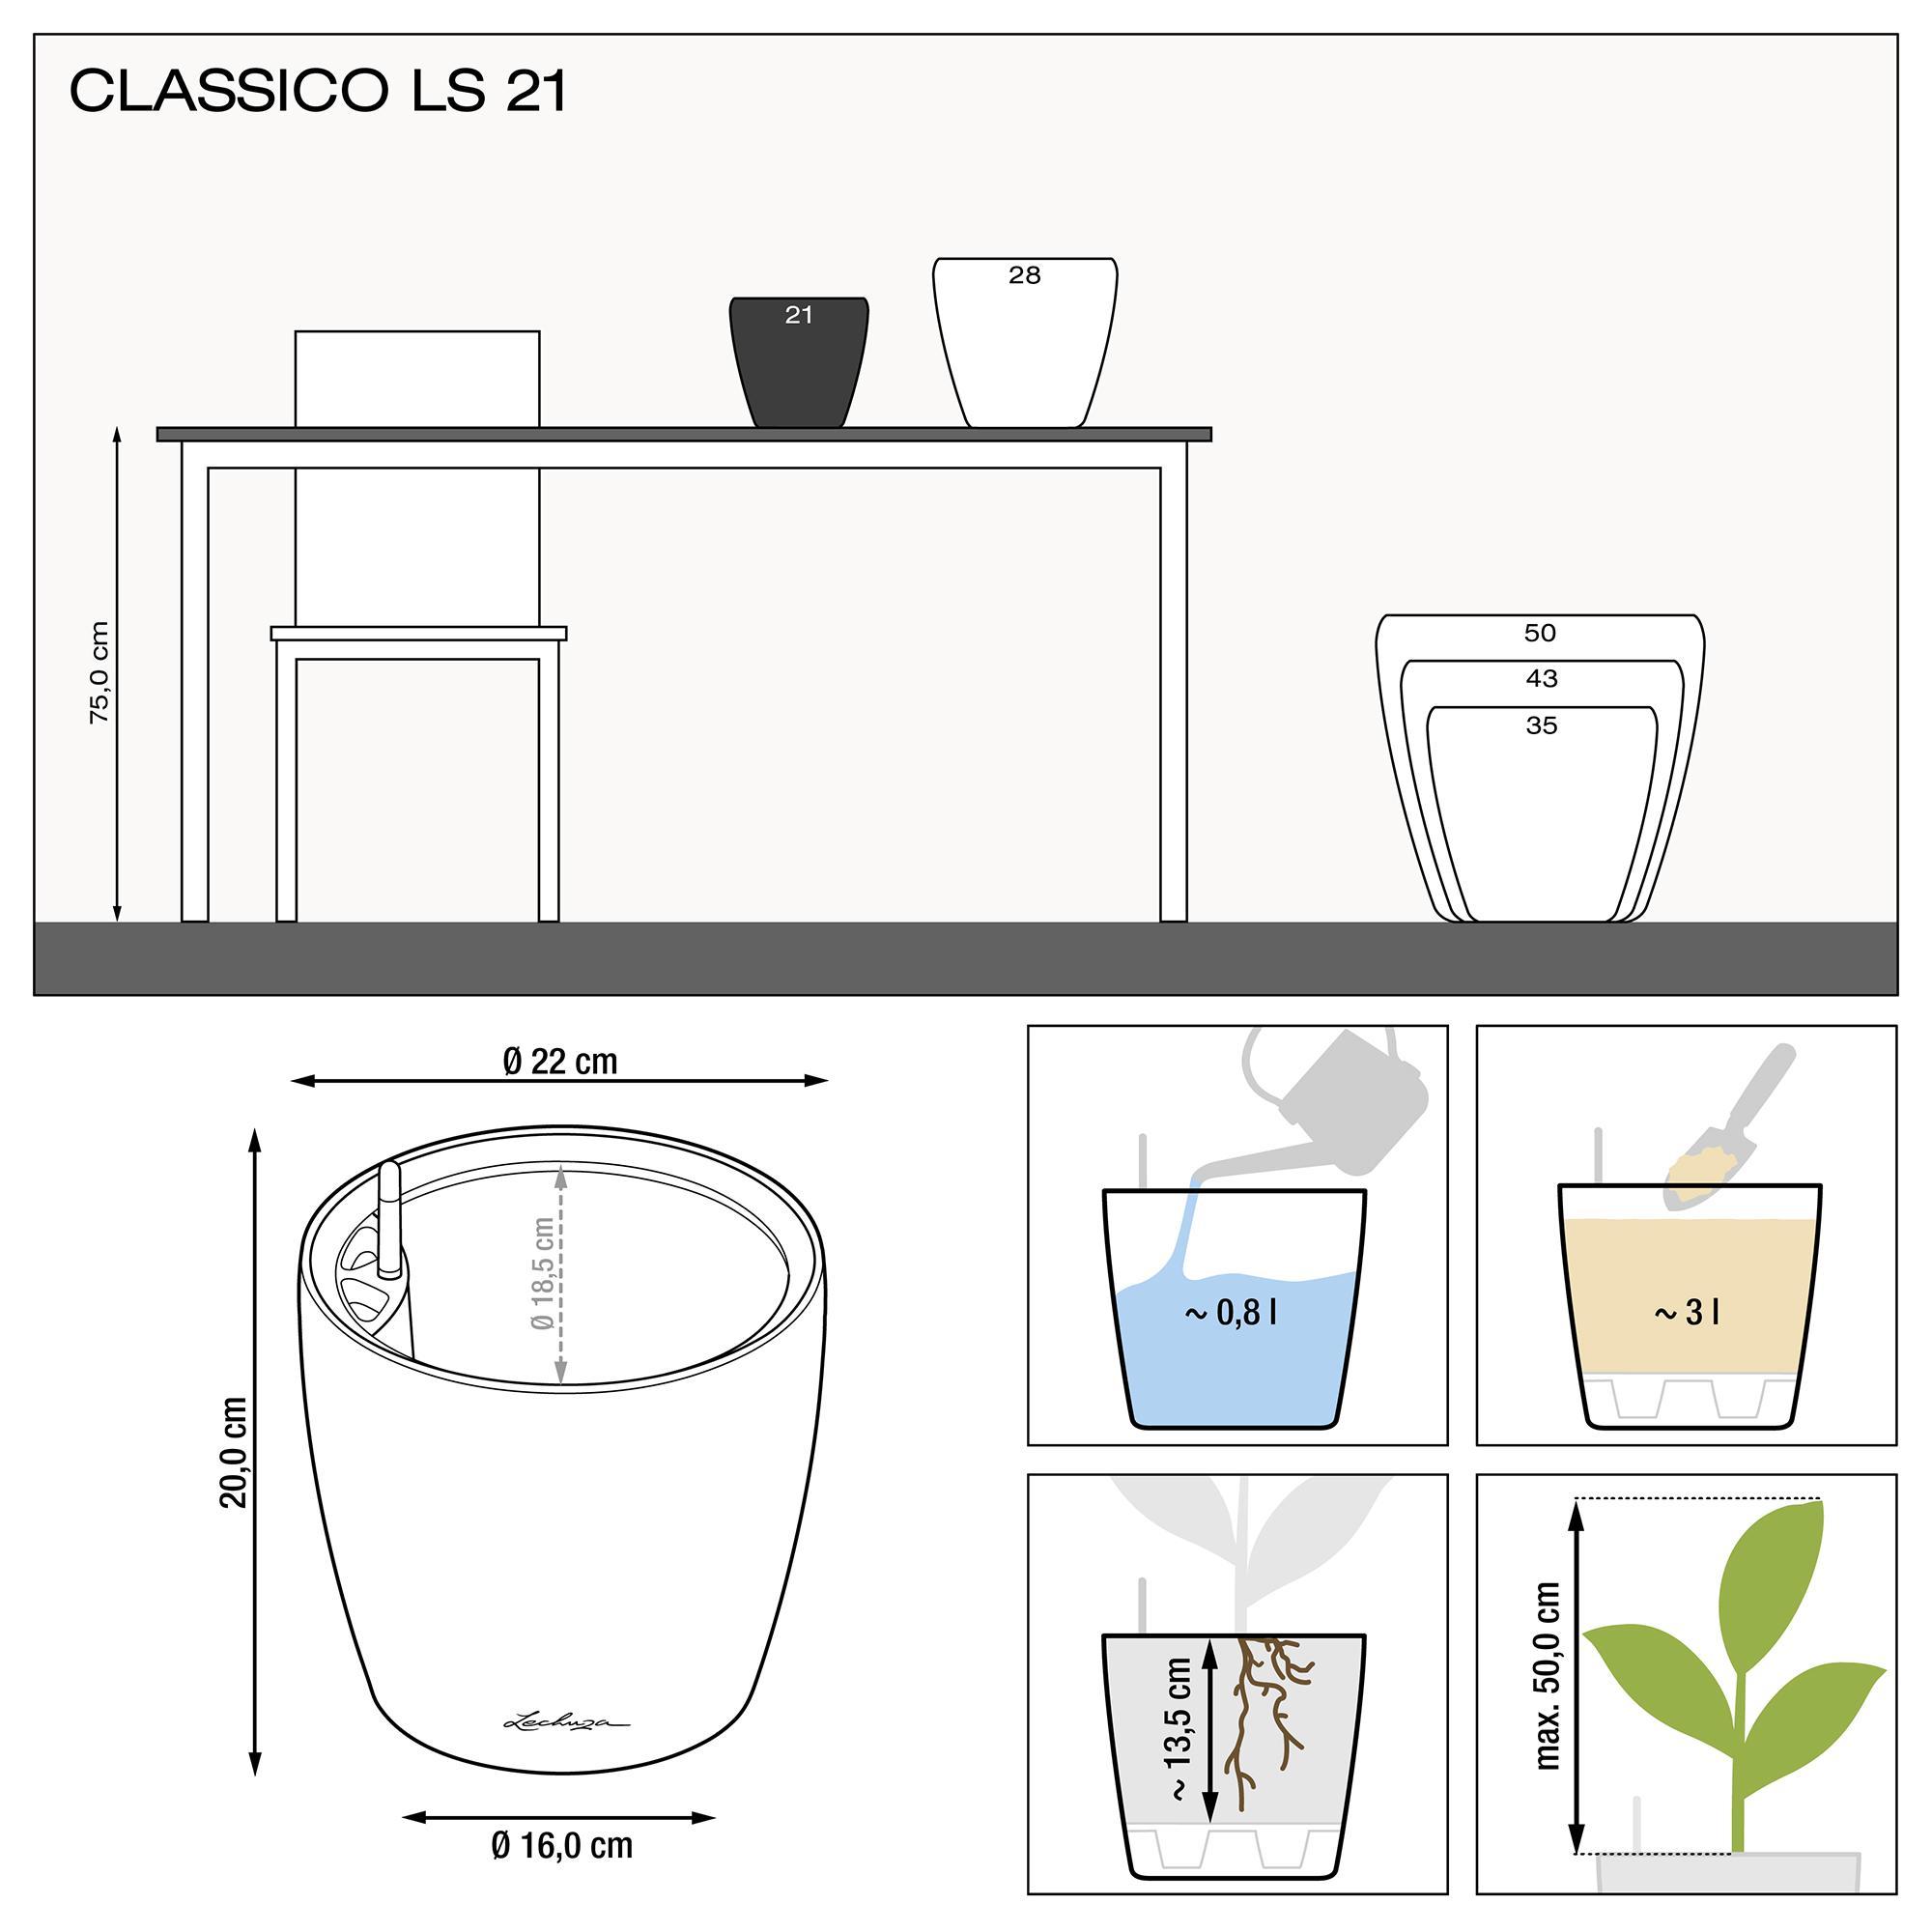 CLASSICO LS 21 silver metallic - Image 3